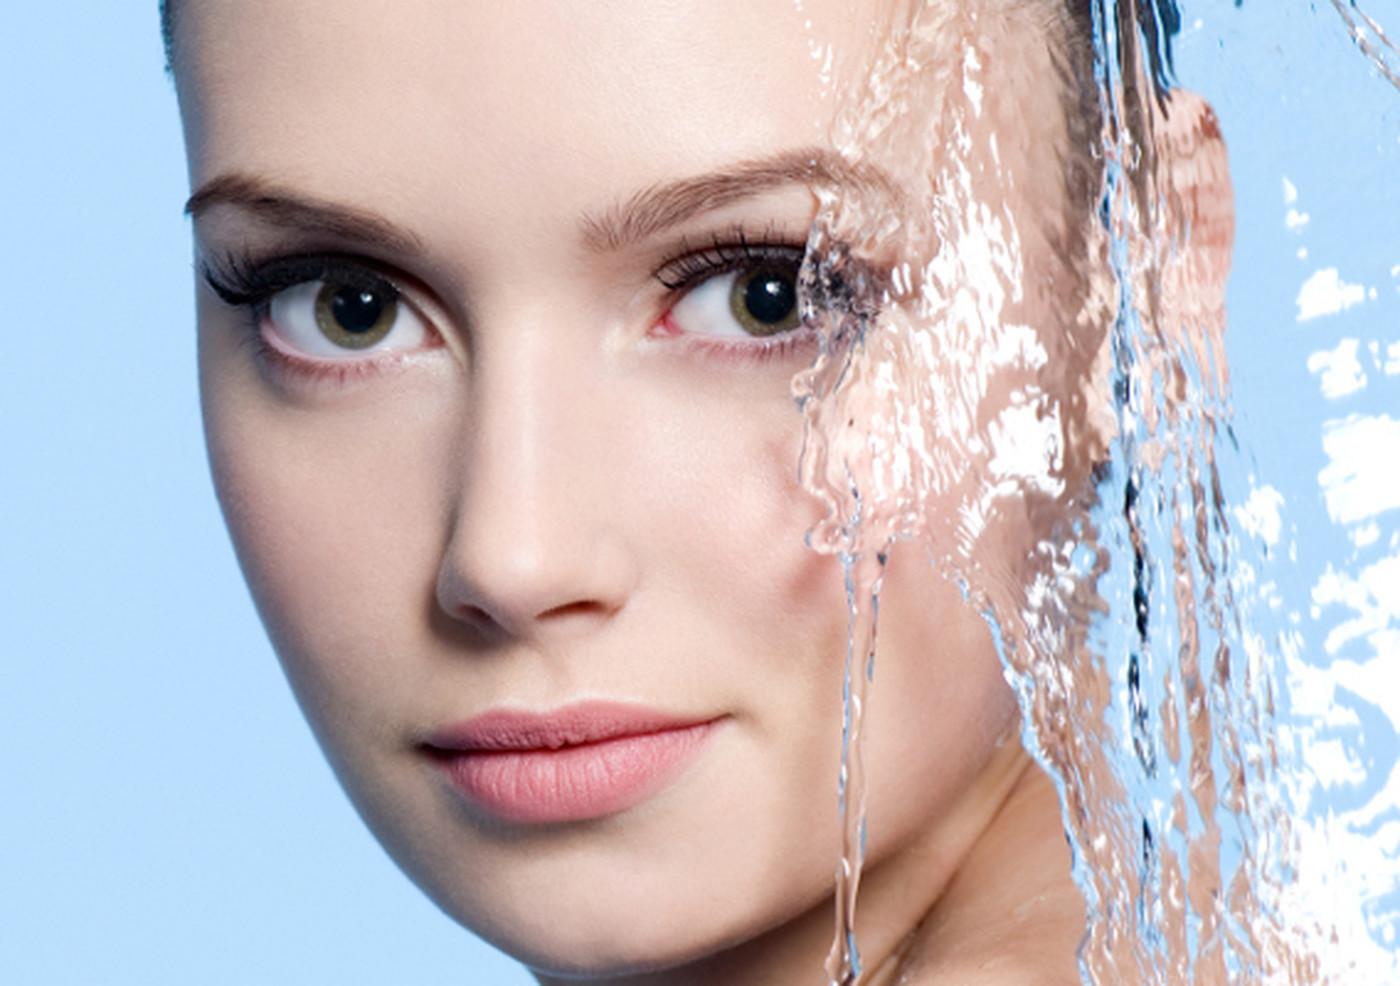 Защита кожи от солнца и морской воды: 5 средств комплексного ухода